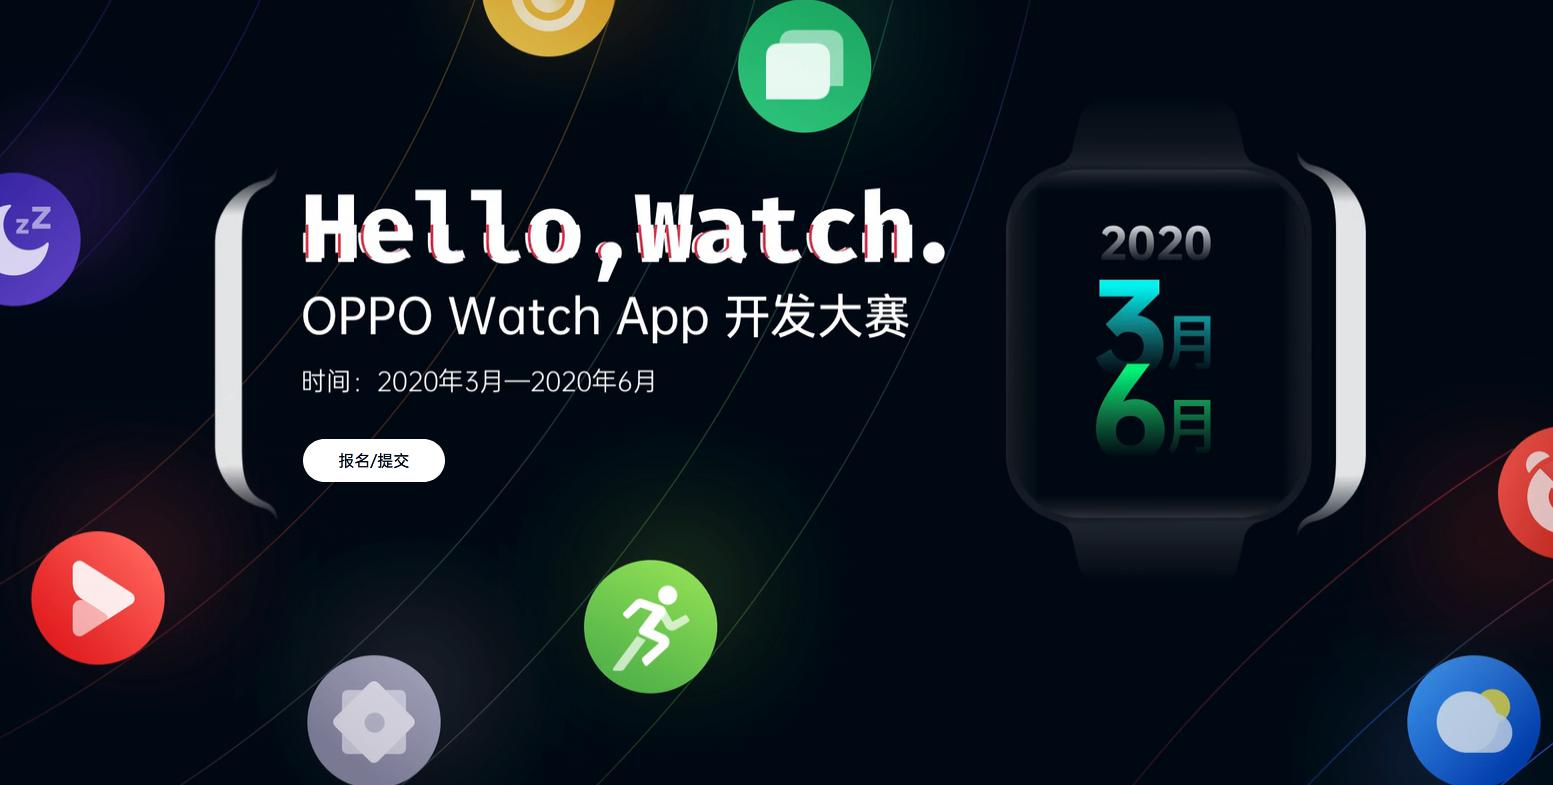 OPPO WATCH APP软件开发大赛正式上线